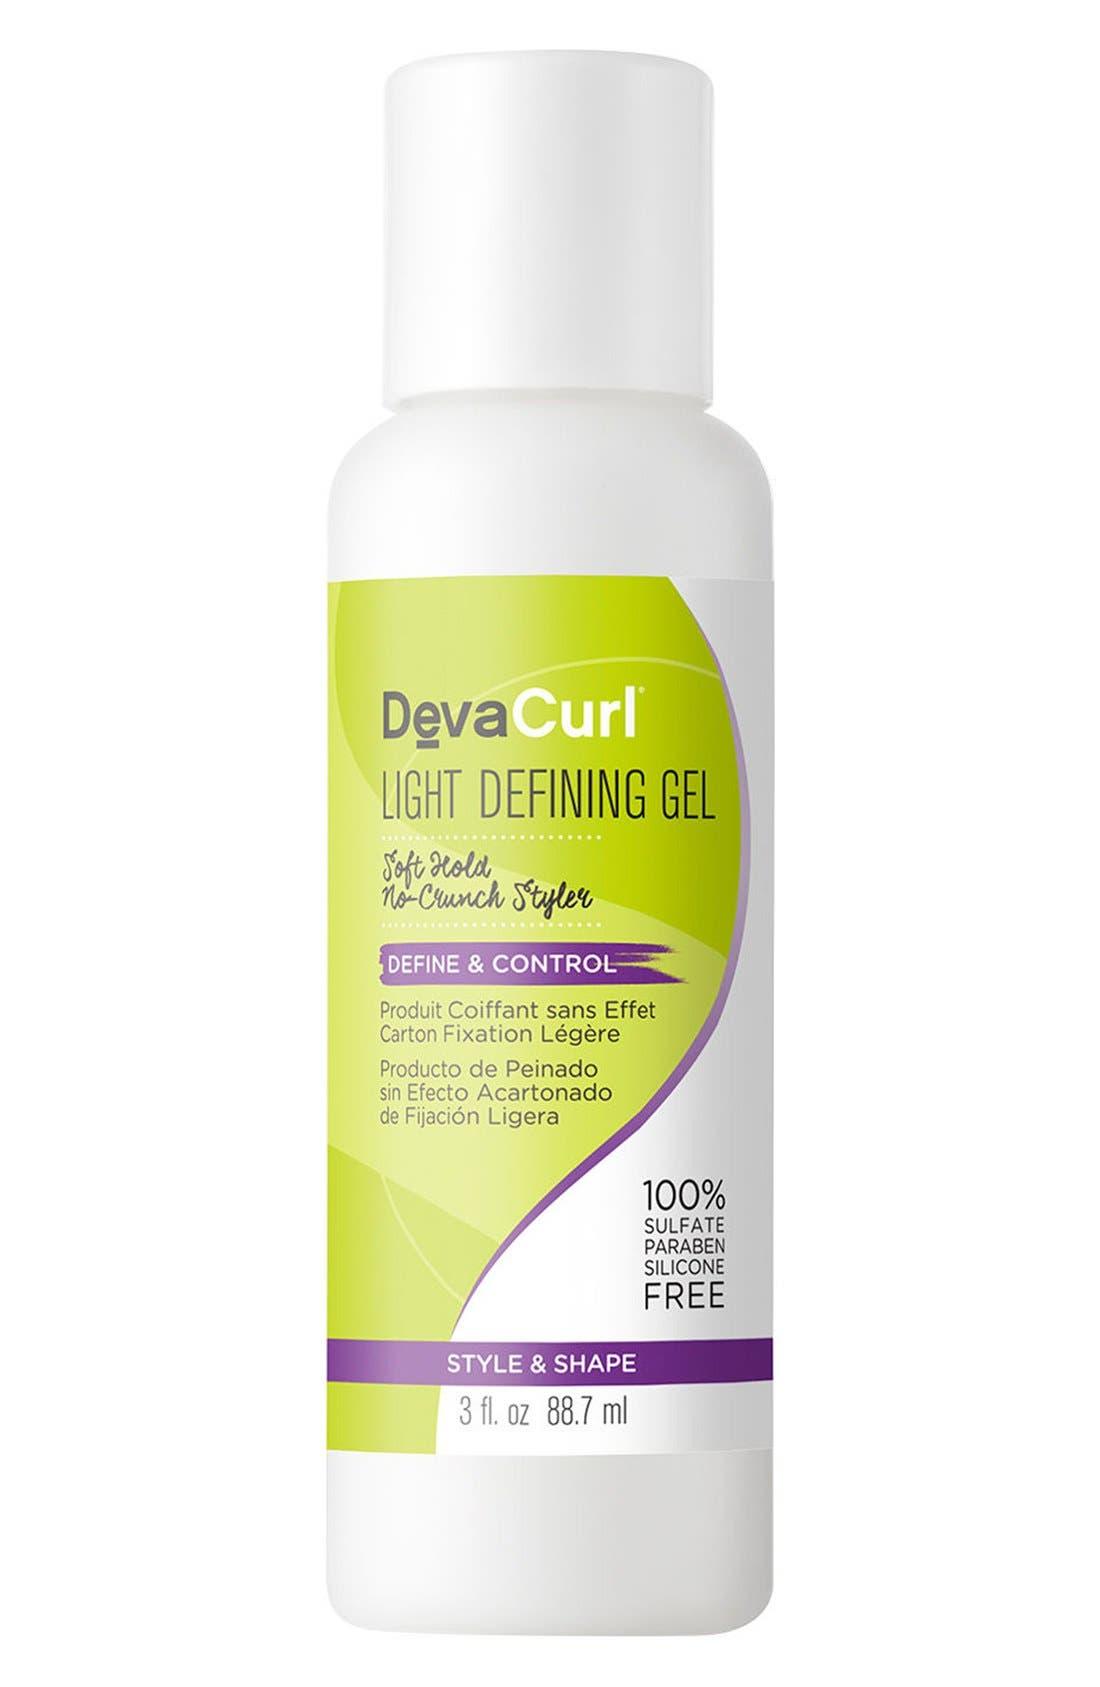 Light Defining Gel Soft Hold No-Crunch Styler,                             Alternate thumbnail 4, color,                             NO COLOR